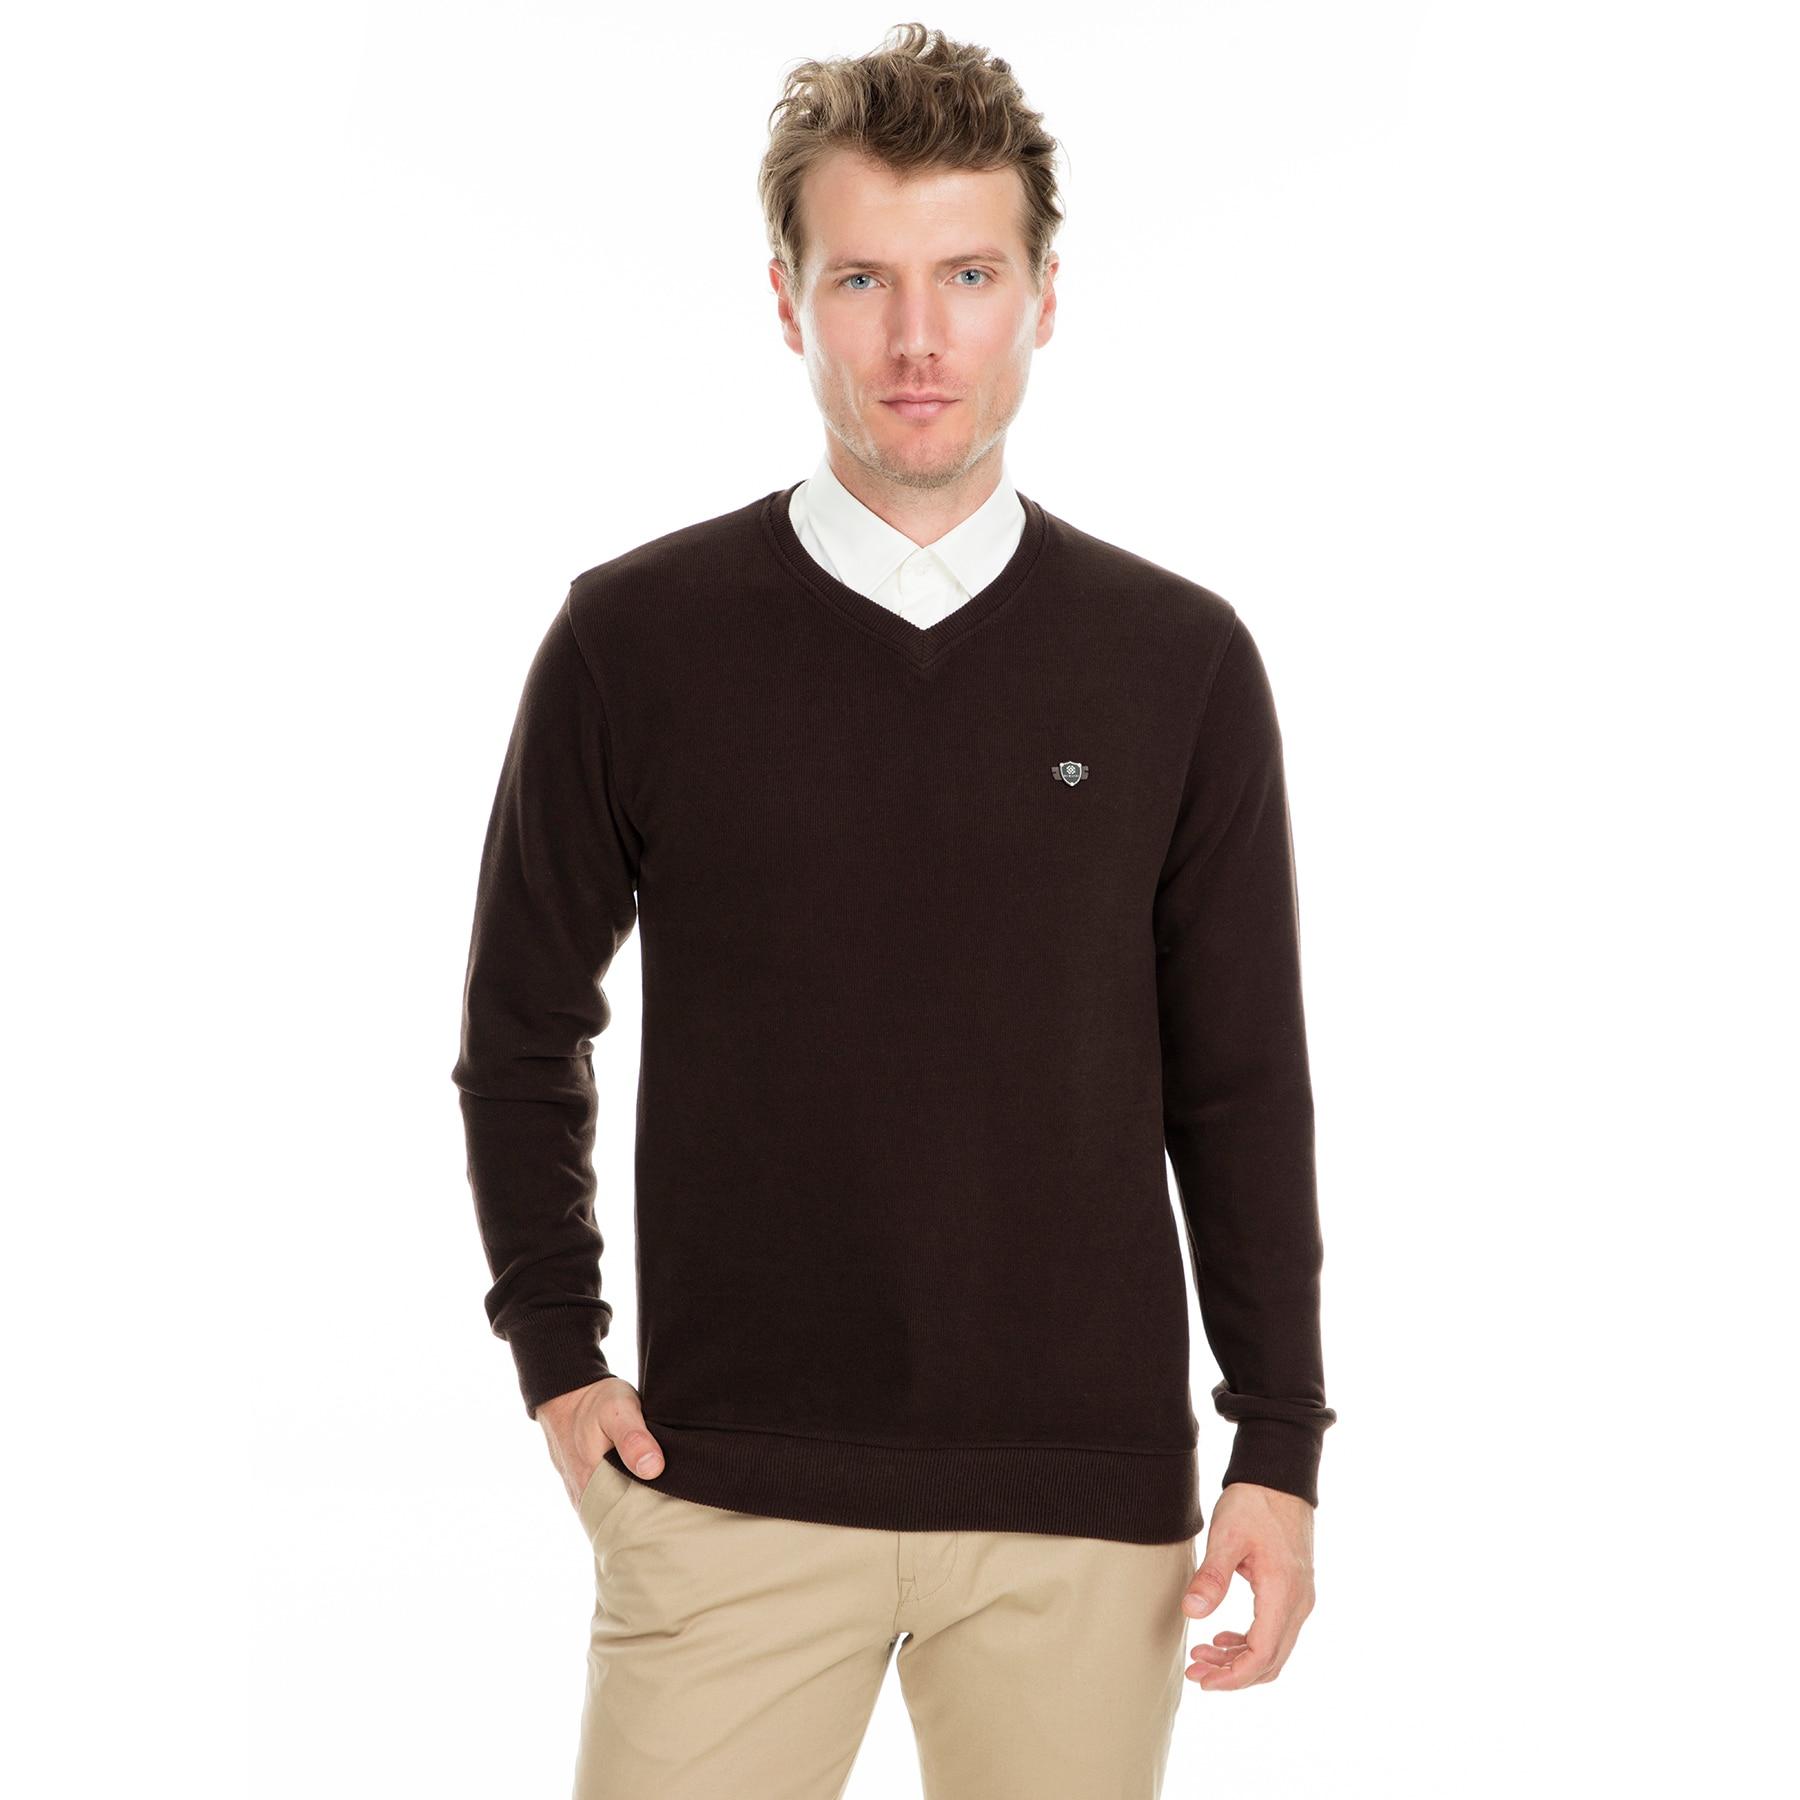 Buratti V-Neck Sweat Long Sleeve Male Sweat Spring Sweatshirts Fashion Men Clothing 4562102